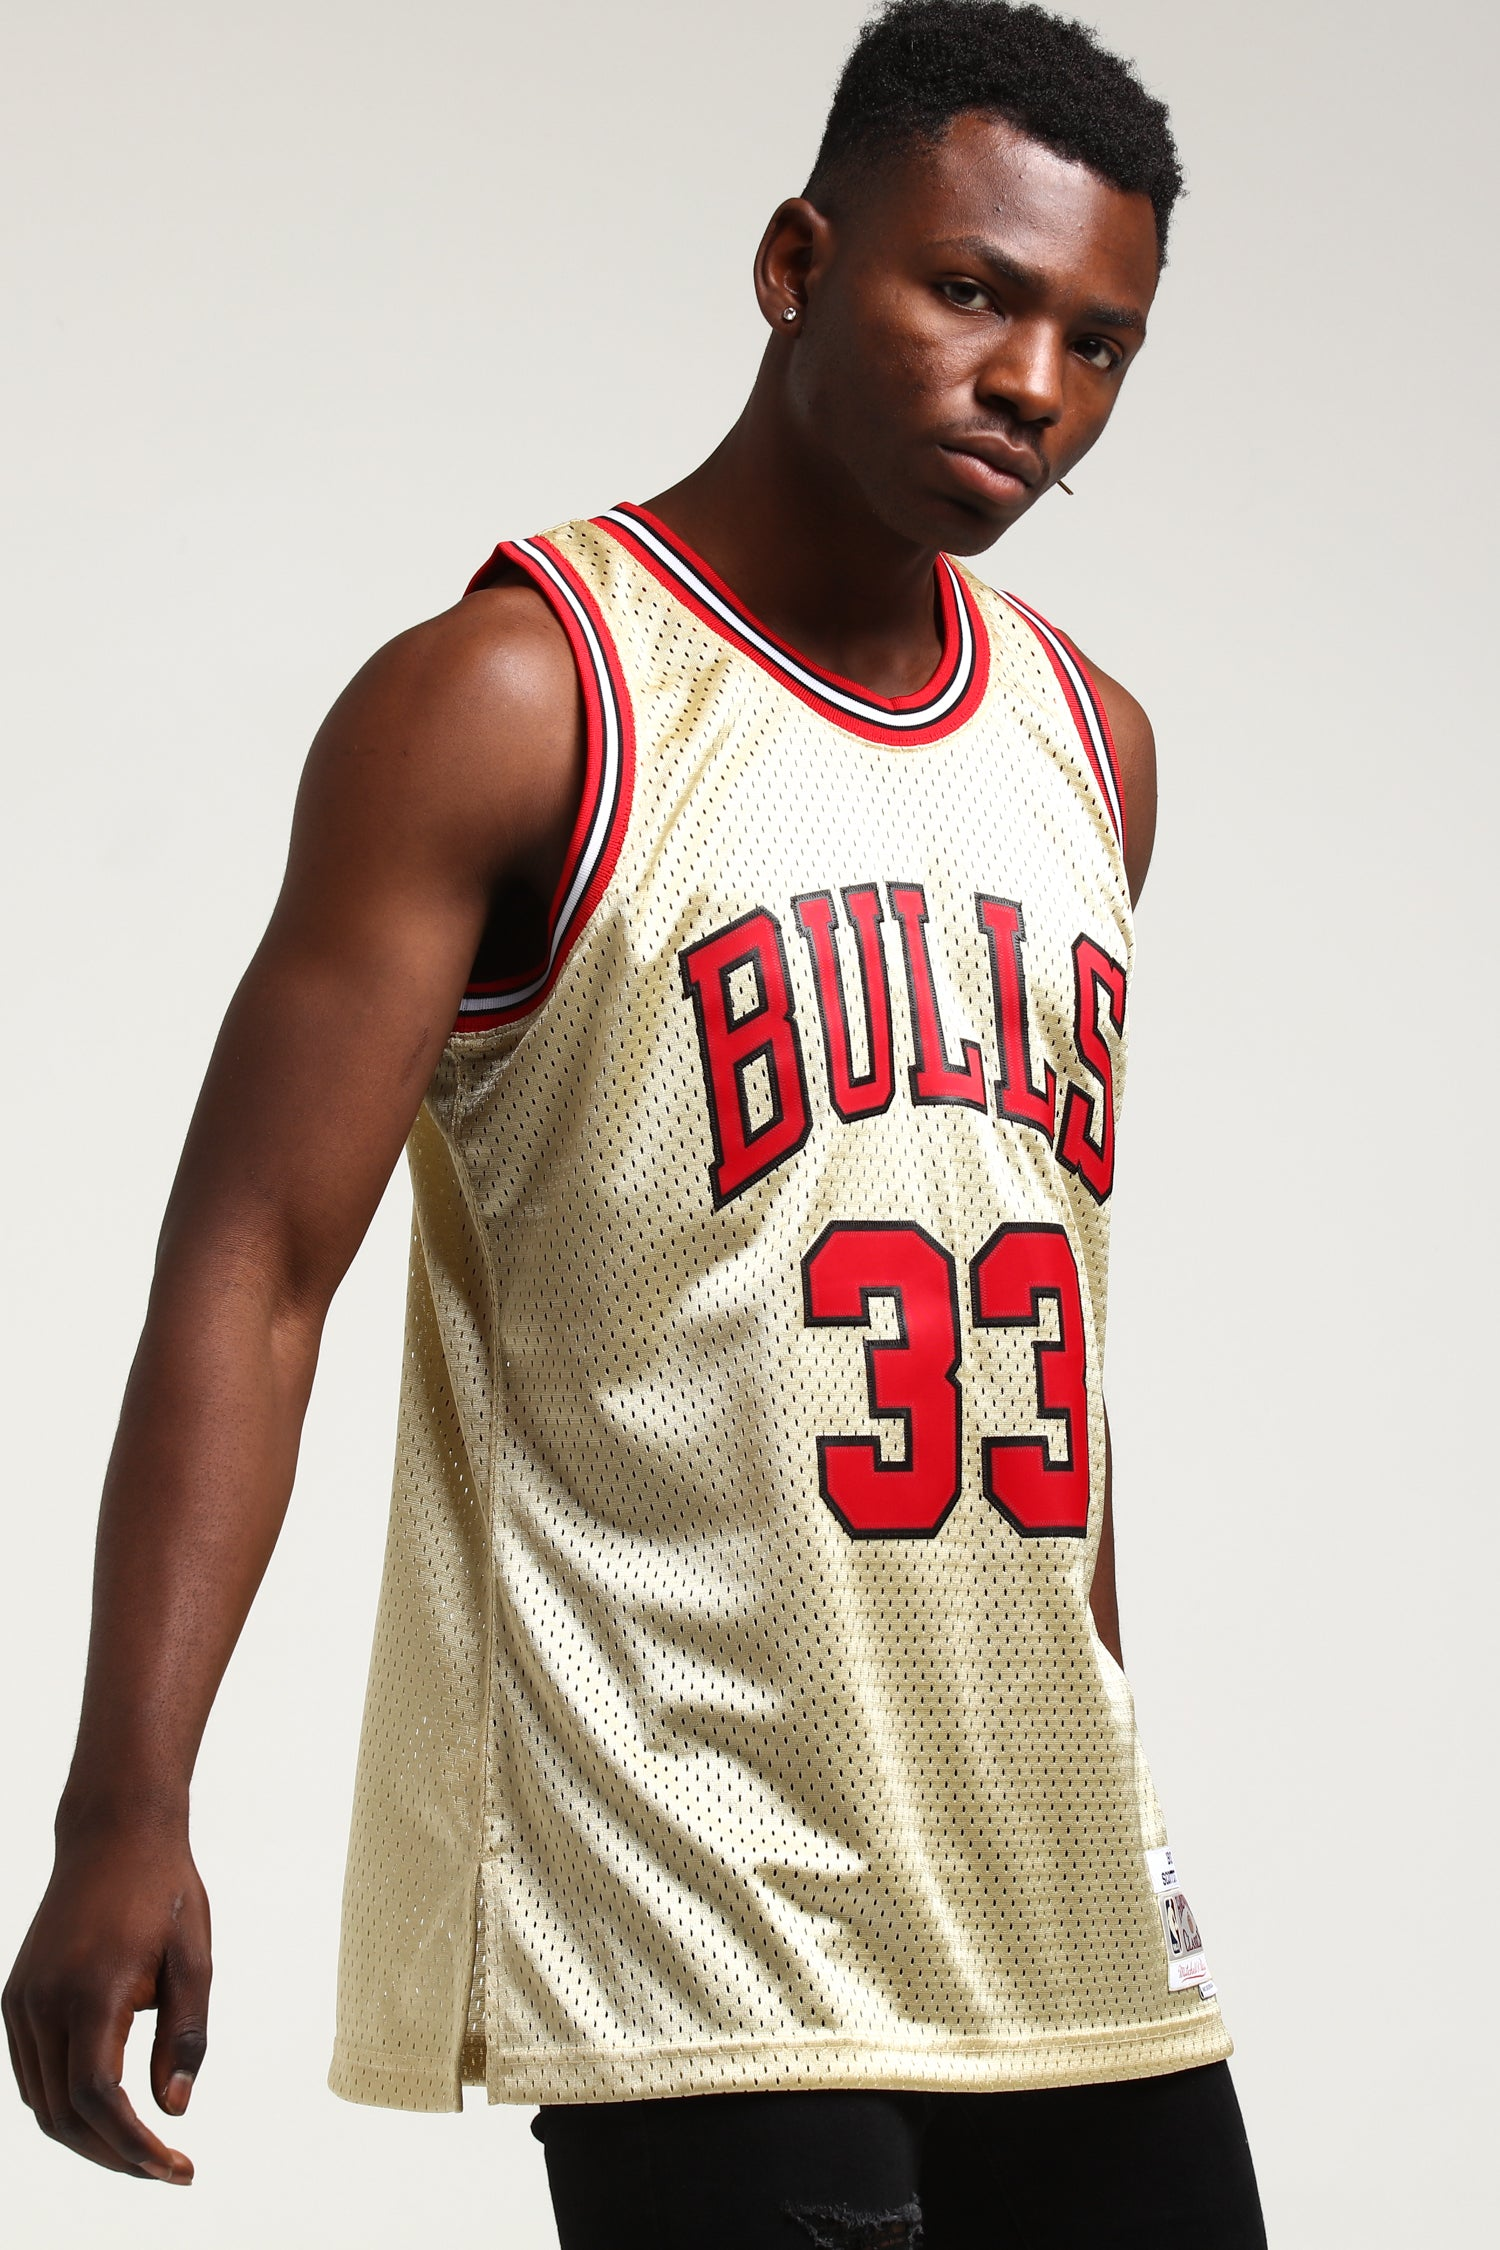 Gold Logo 96 97 Swingman Scottie Pippen #33 Chicago Bulls Stitched Jersey Stripe